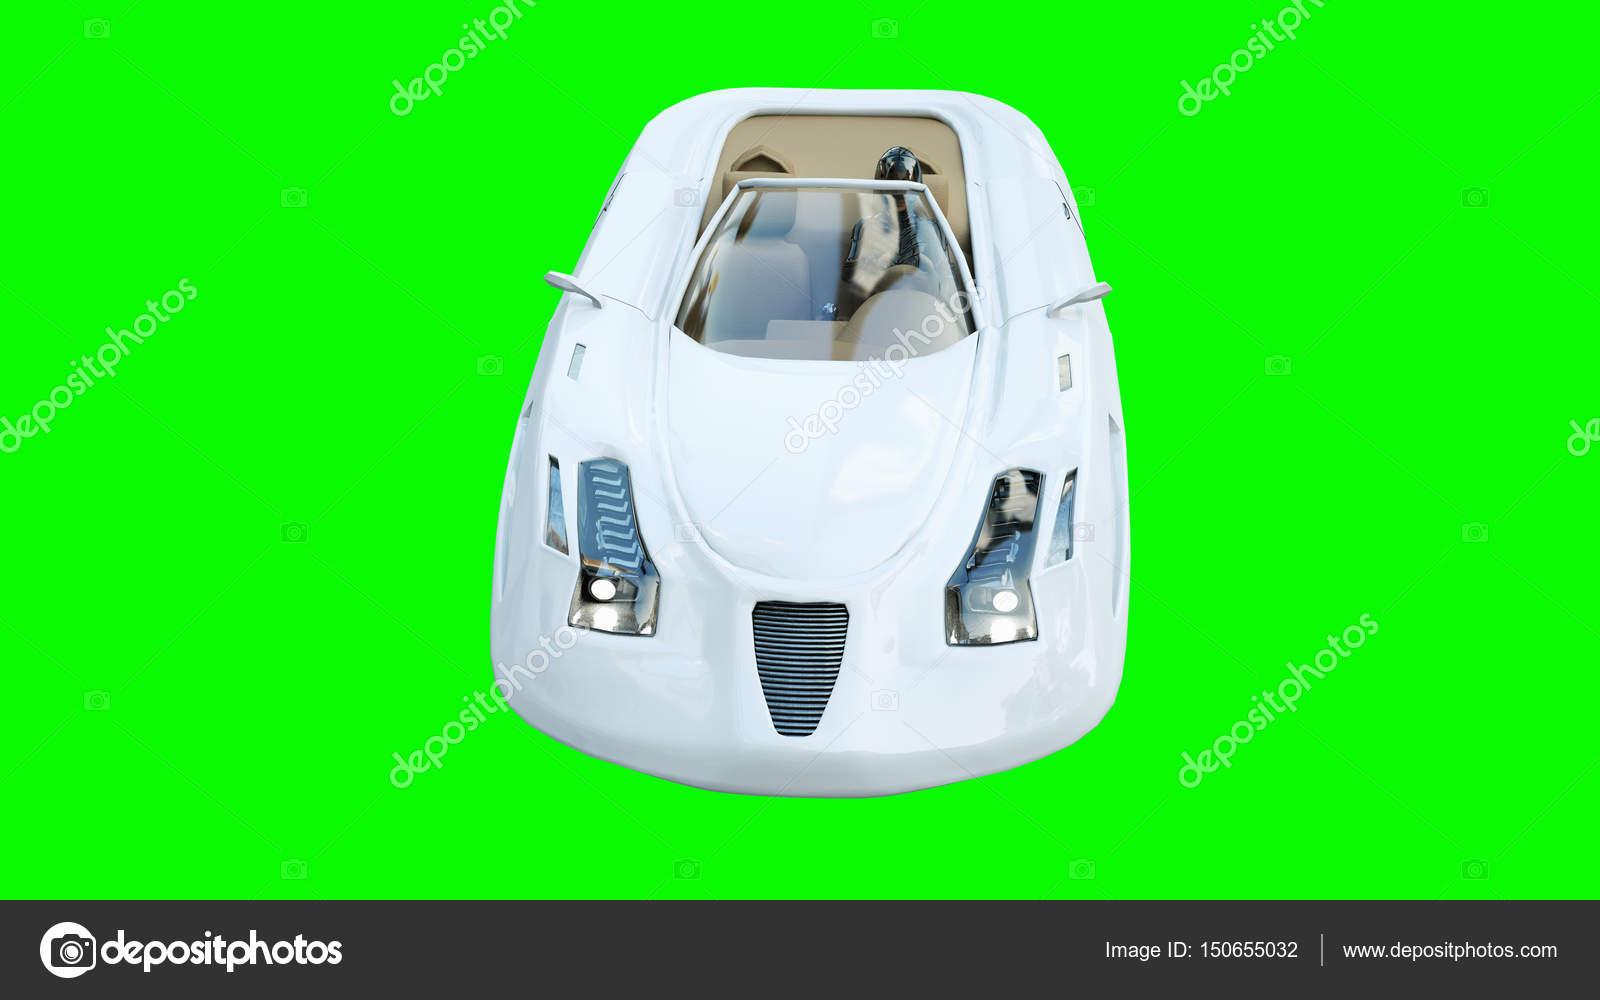 FemmeTransport Voiture Futuriste Avec Volante De L'avenirIsoler AR54jL